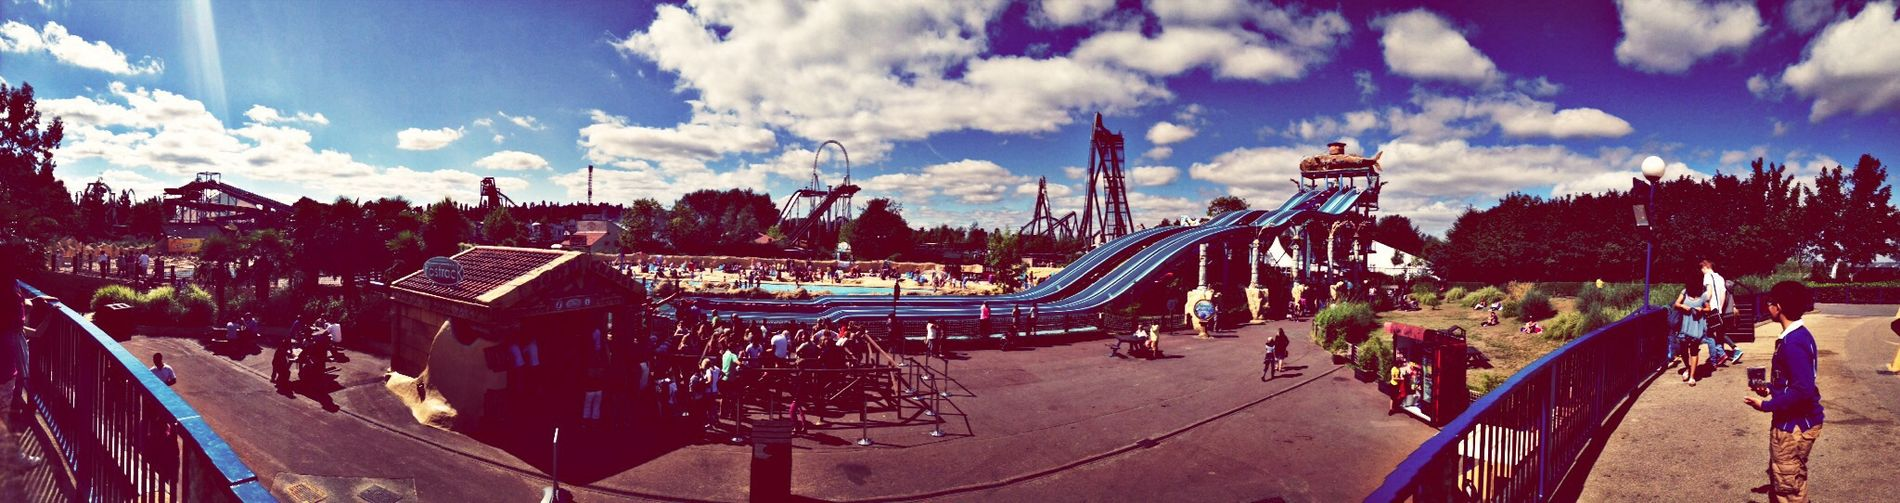 Thorpe park view..